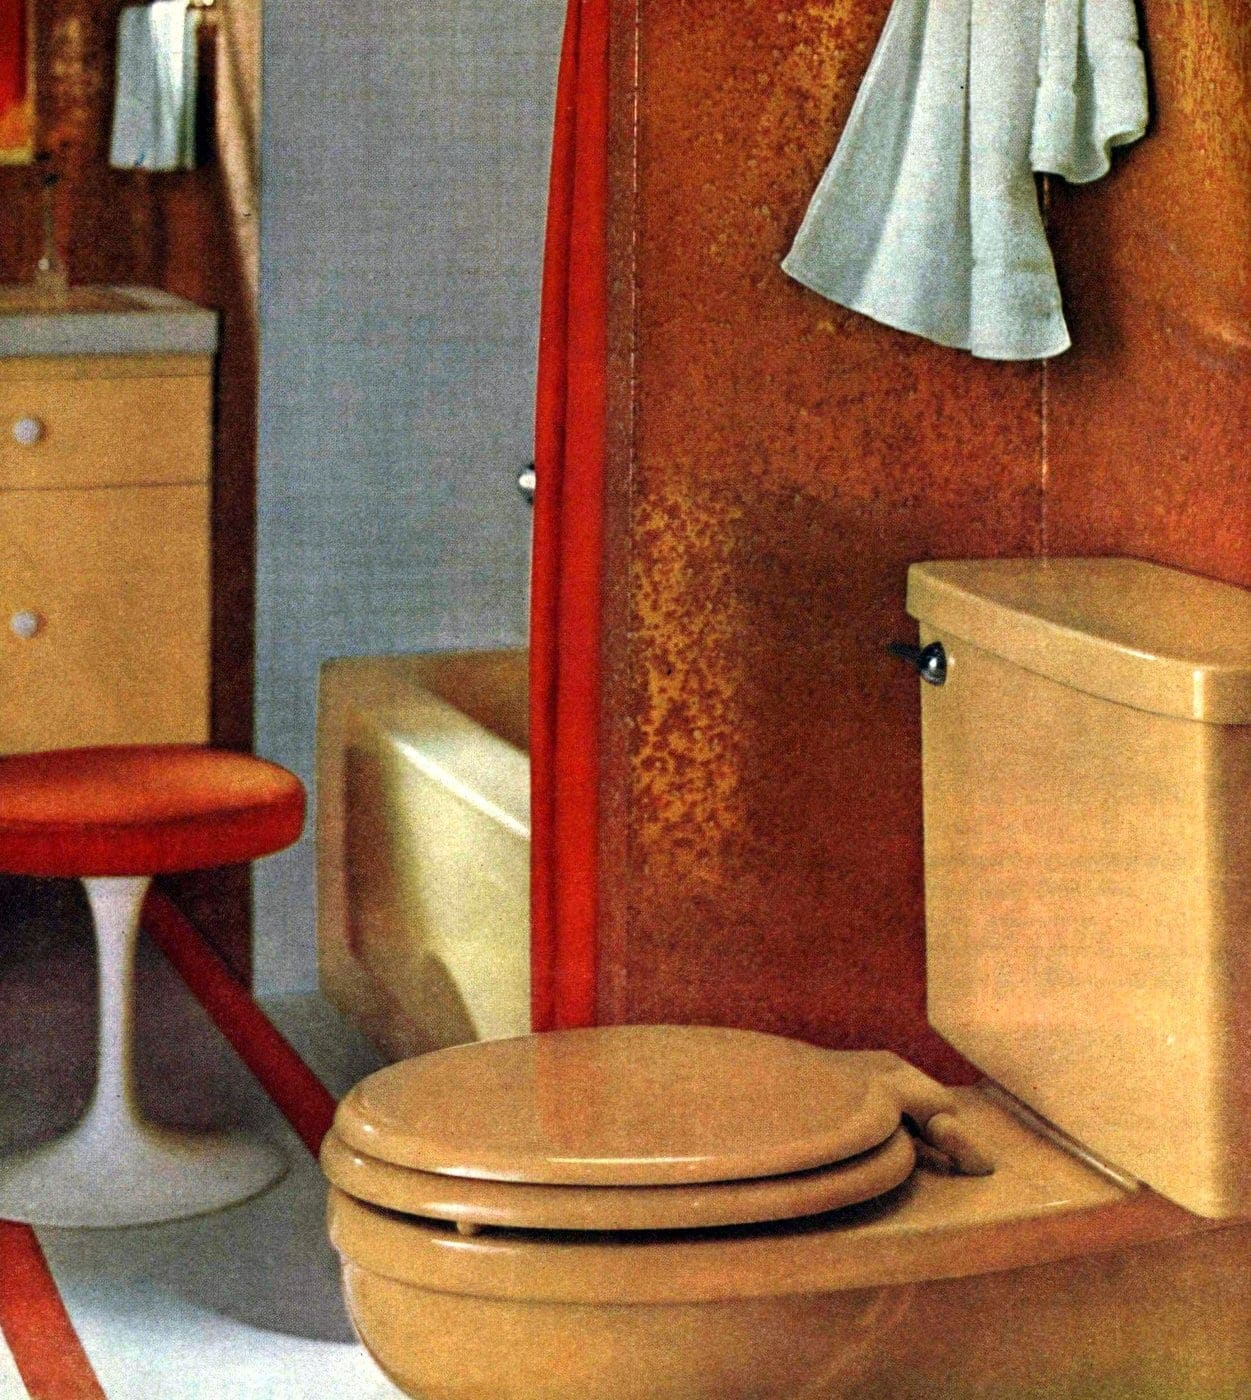 Vintage 60s bathroom decor ideas (2)